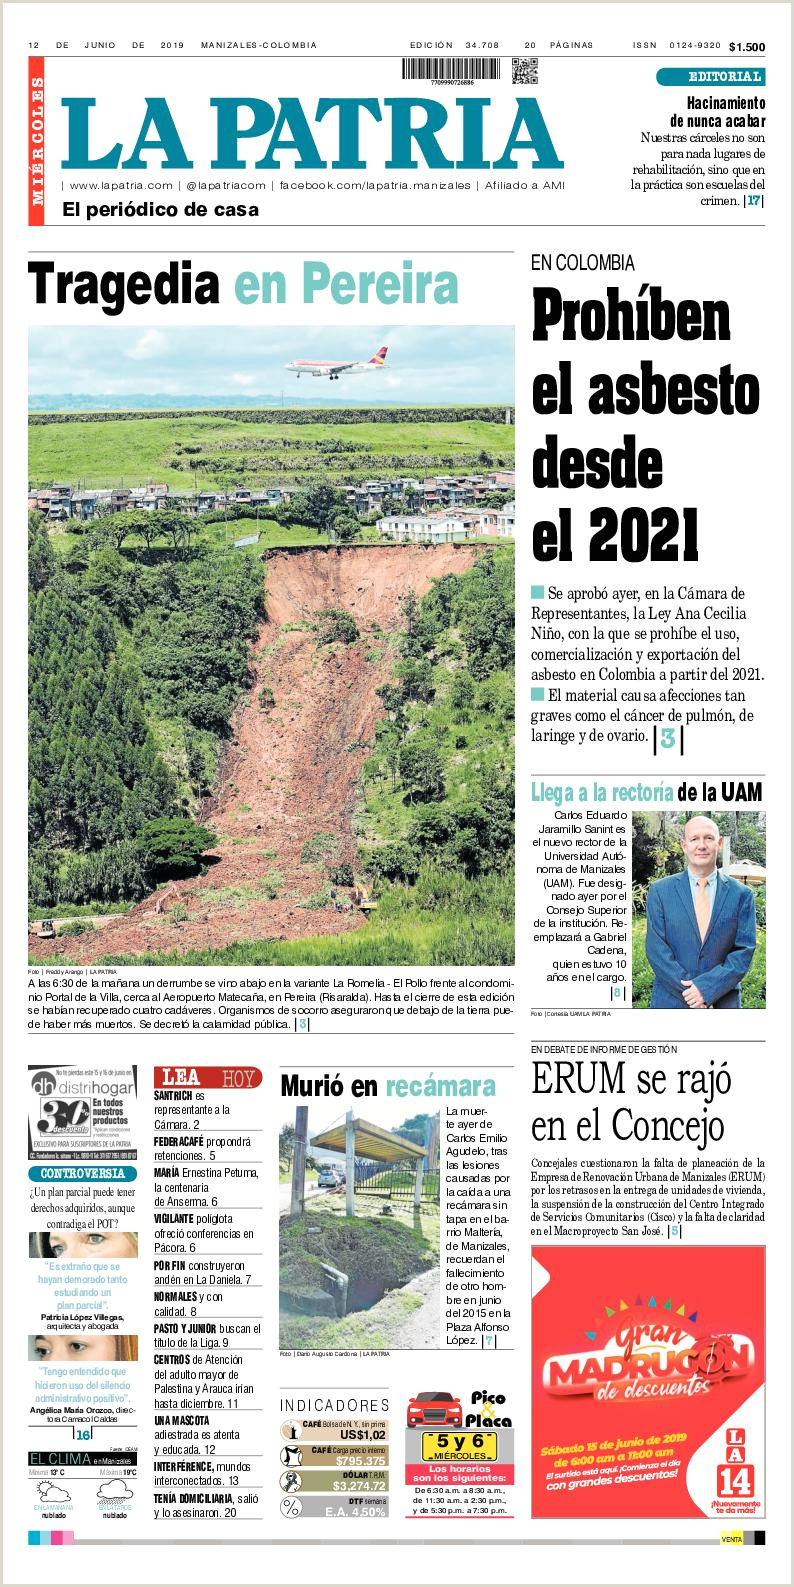 Formato Unico Hoja De Vida Fiduprevisora Calaméo Lapatria 12 06 2019